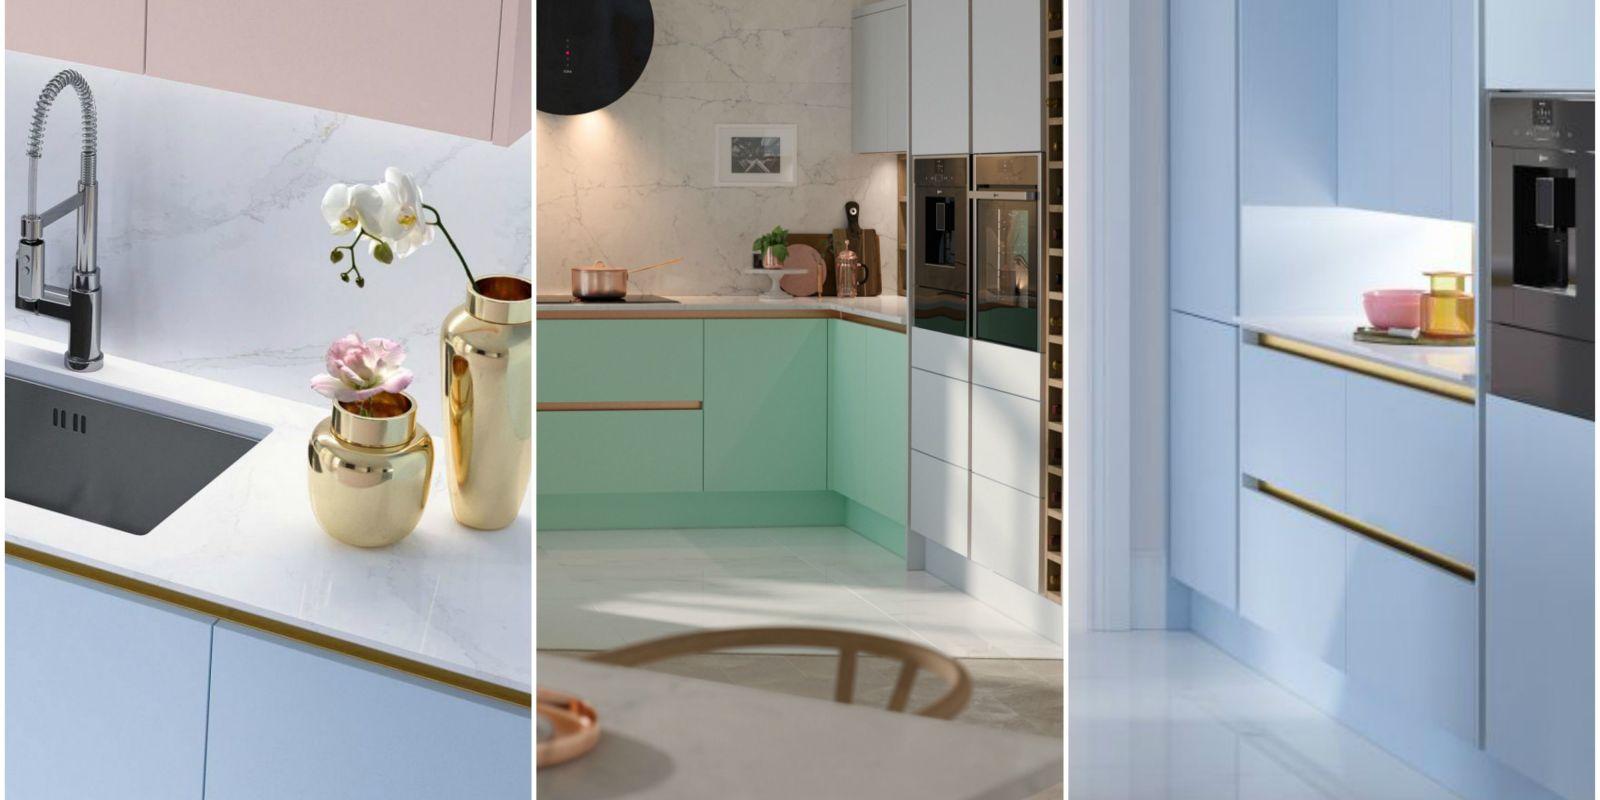 colours for kitchen walls 2018 ekenasfiber johnhenriksson se u2022 rh ekenasfiber johnhenriksson se